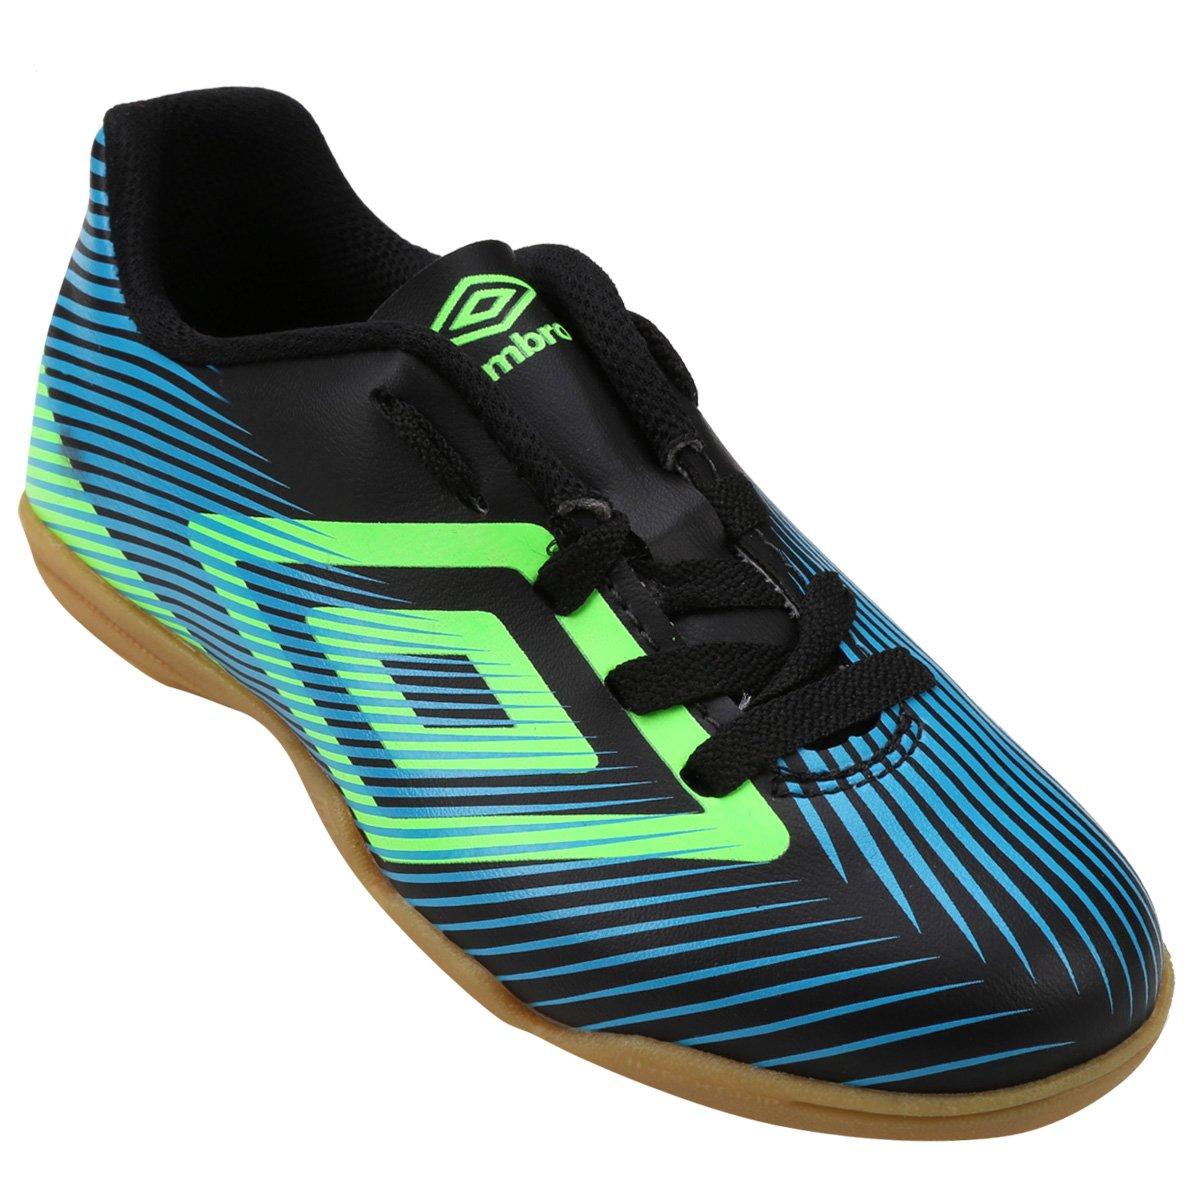 4edc1166087f4 Chuteira Futsal Infantil Umbro Speed II - Compre Agora